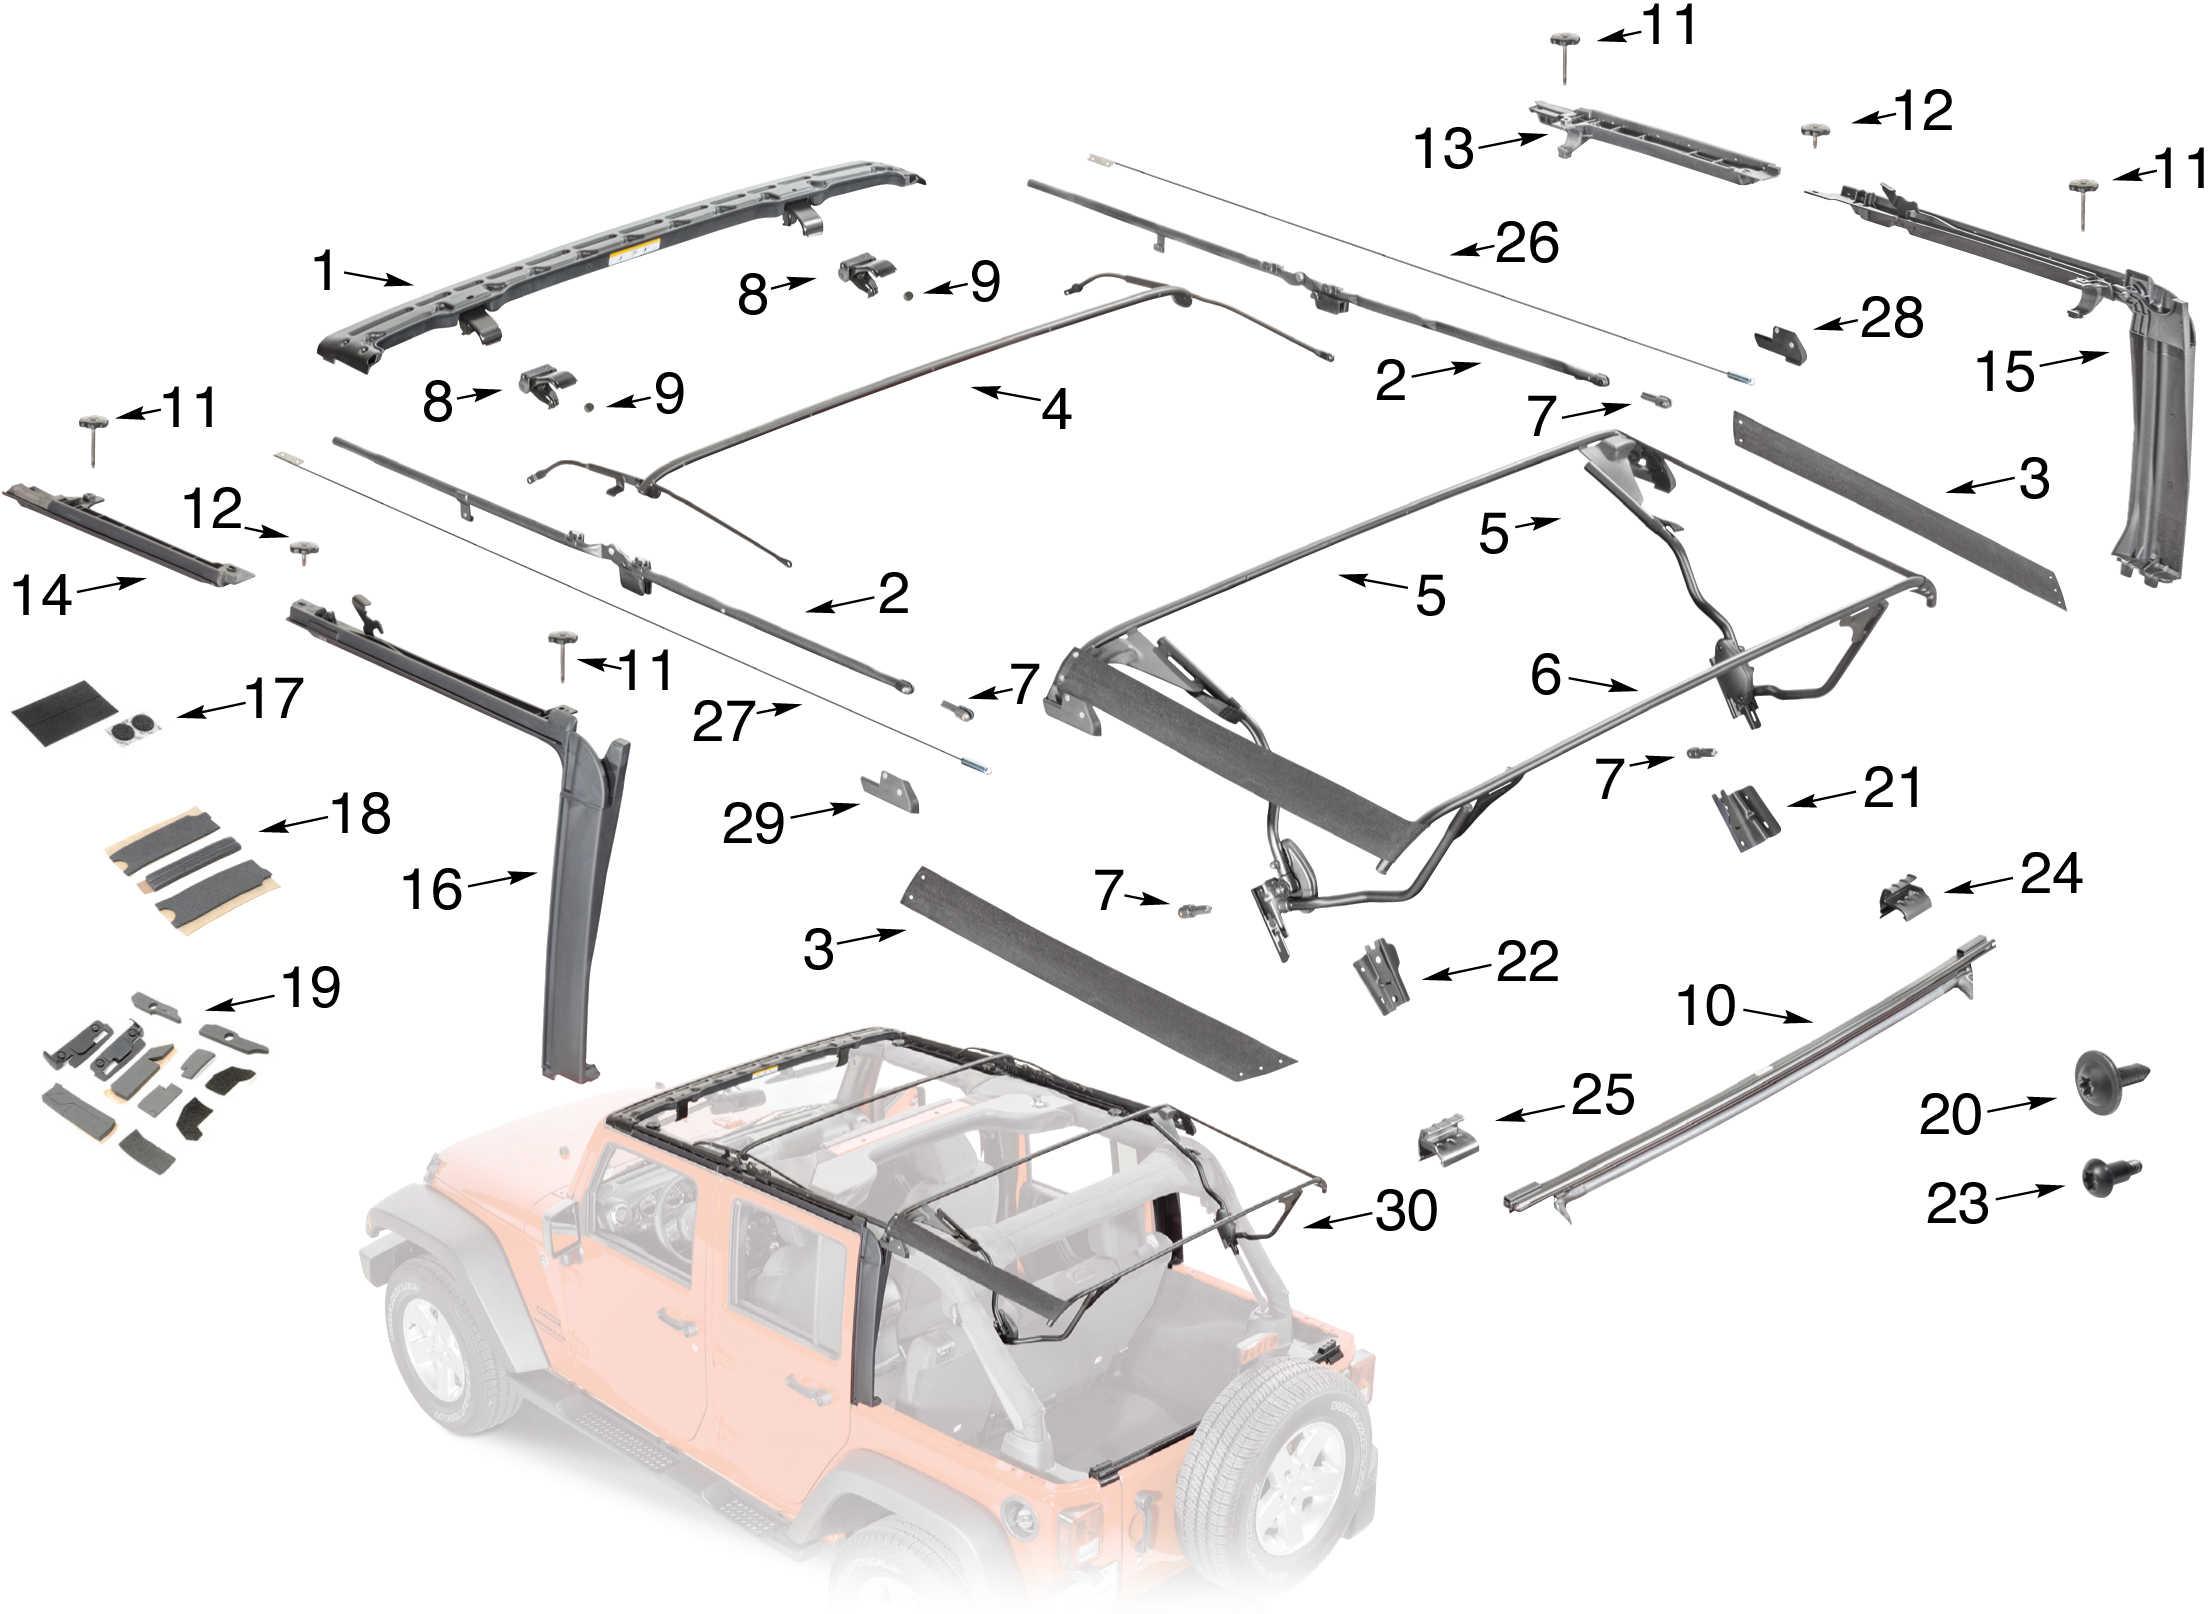 hight resolution of jk top diagram all kind of wiring diagrams u2022 access wiring diagram bestop wiring diagram